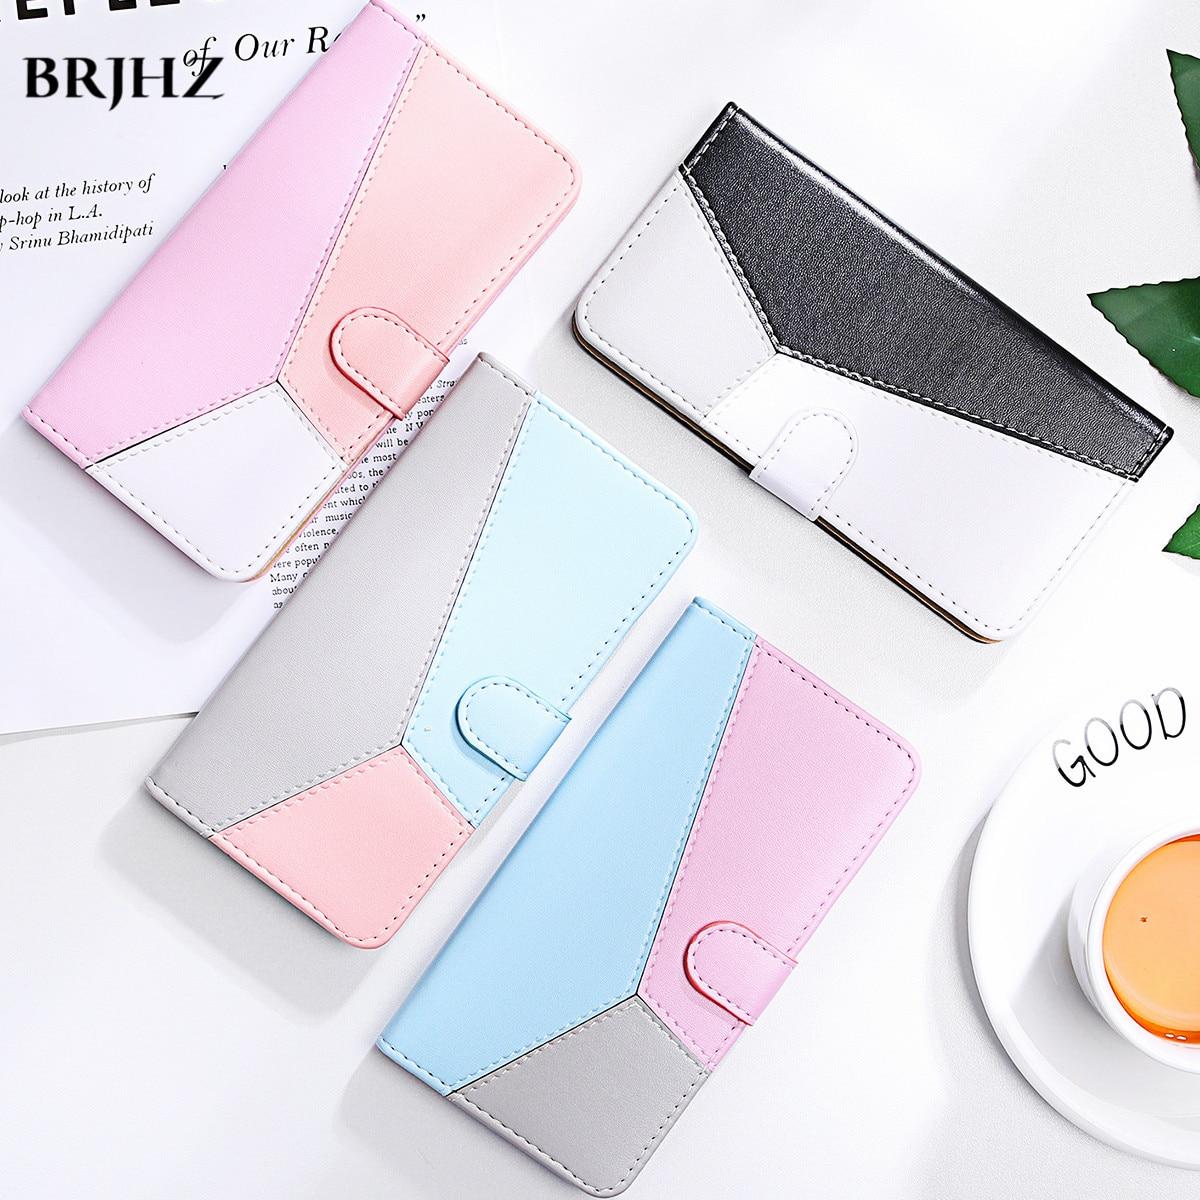 Новый кожаный чехол для телефона на samsung Galaxy A40 A10 A20 A30 A50 A70 A80 A10e A20e A10s A20s A30s A50s Примечание 10 Pro Чехол